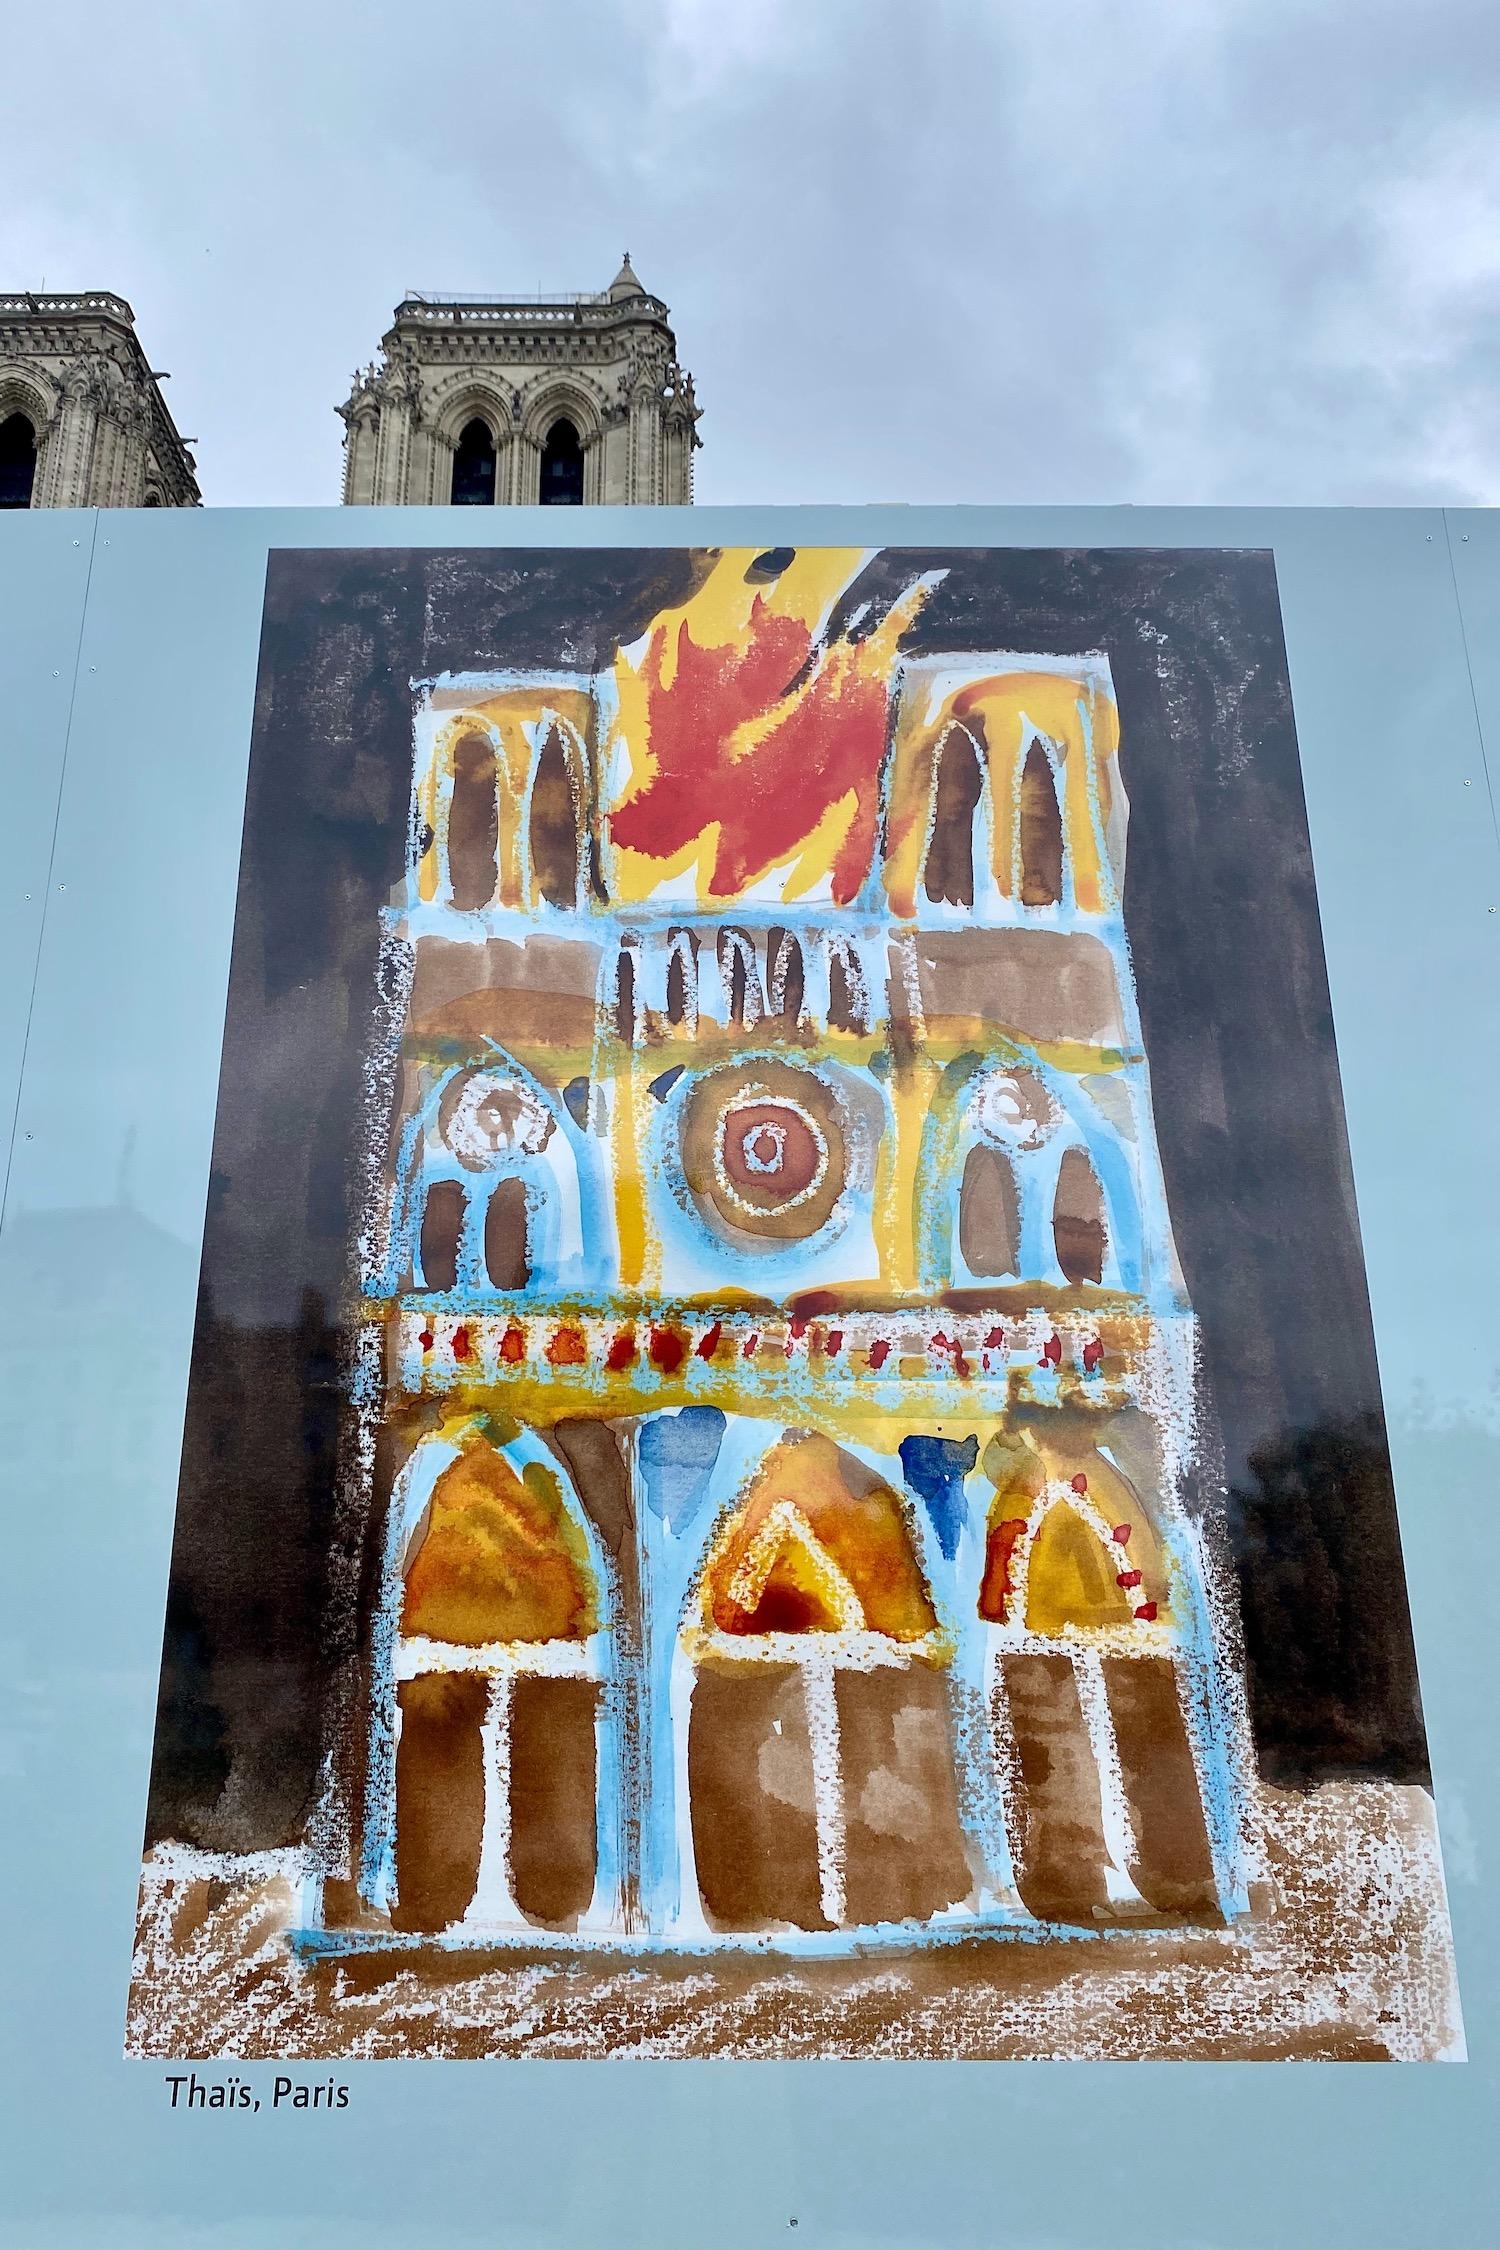 Children's art in front of Notre Dame